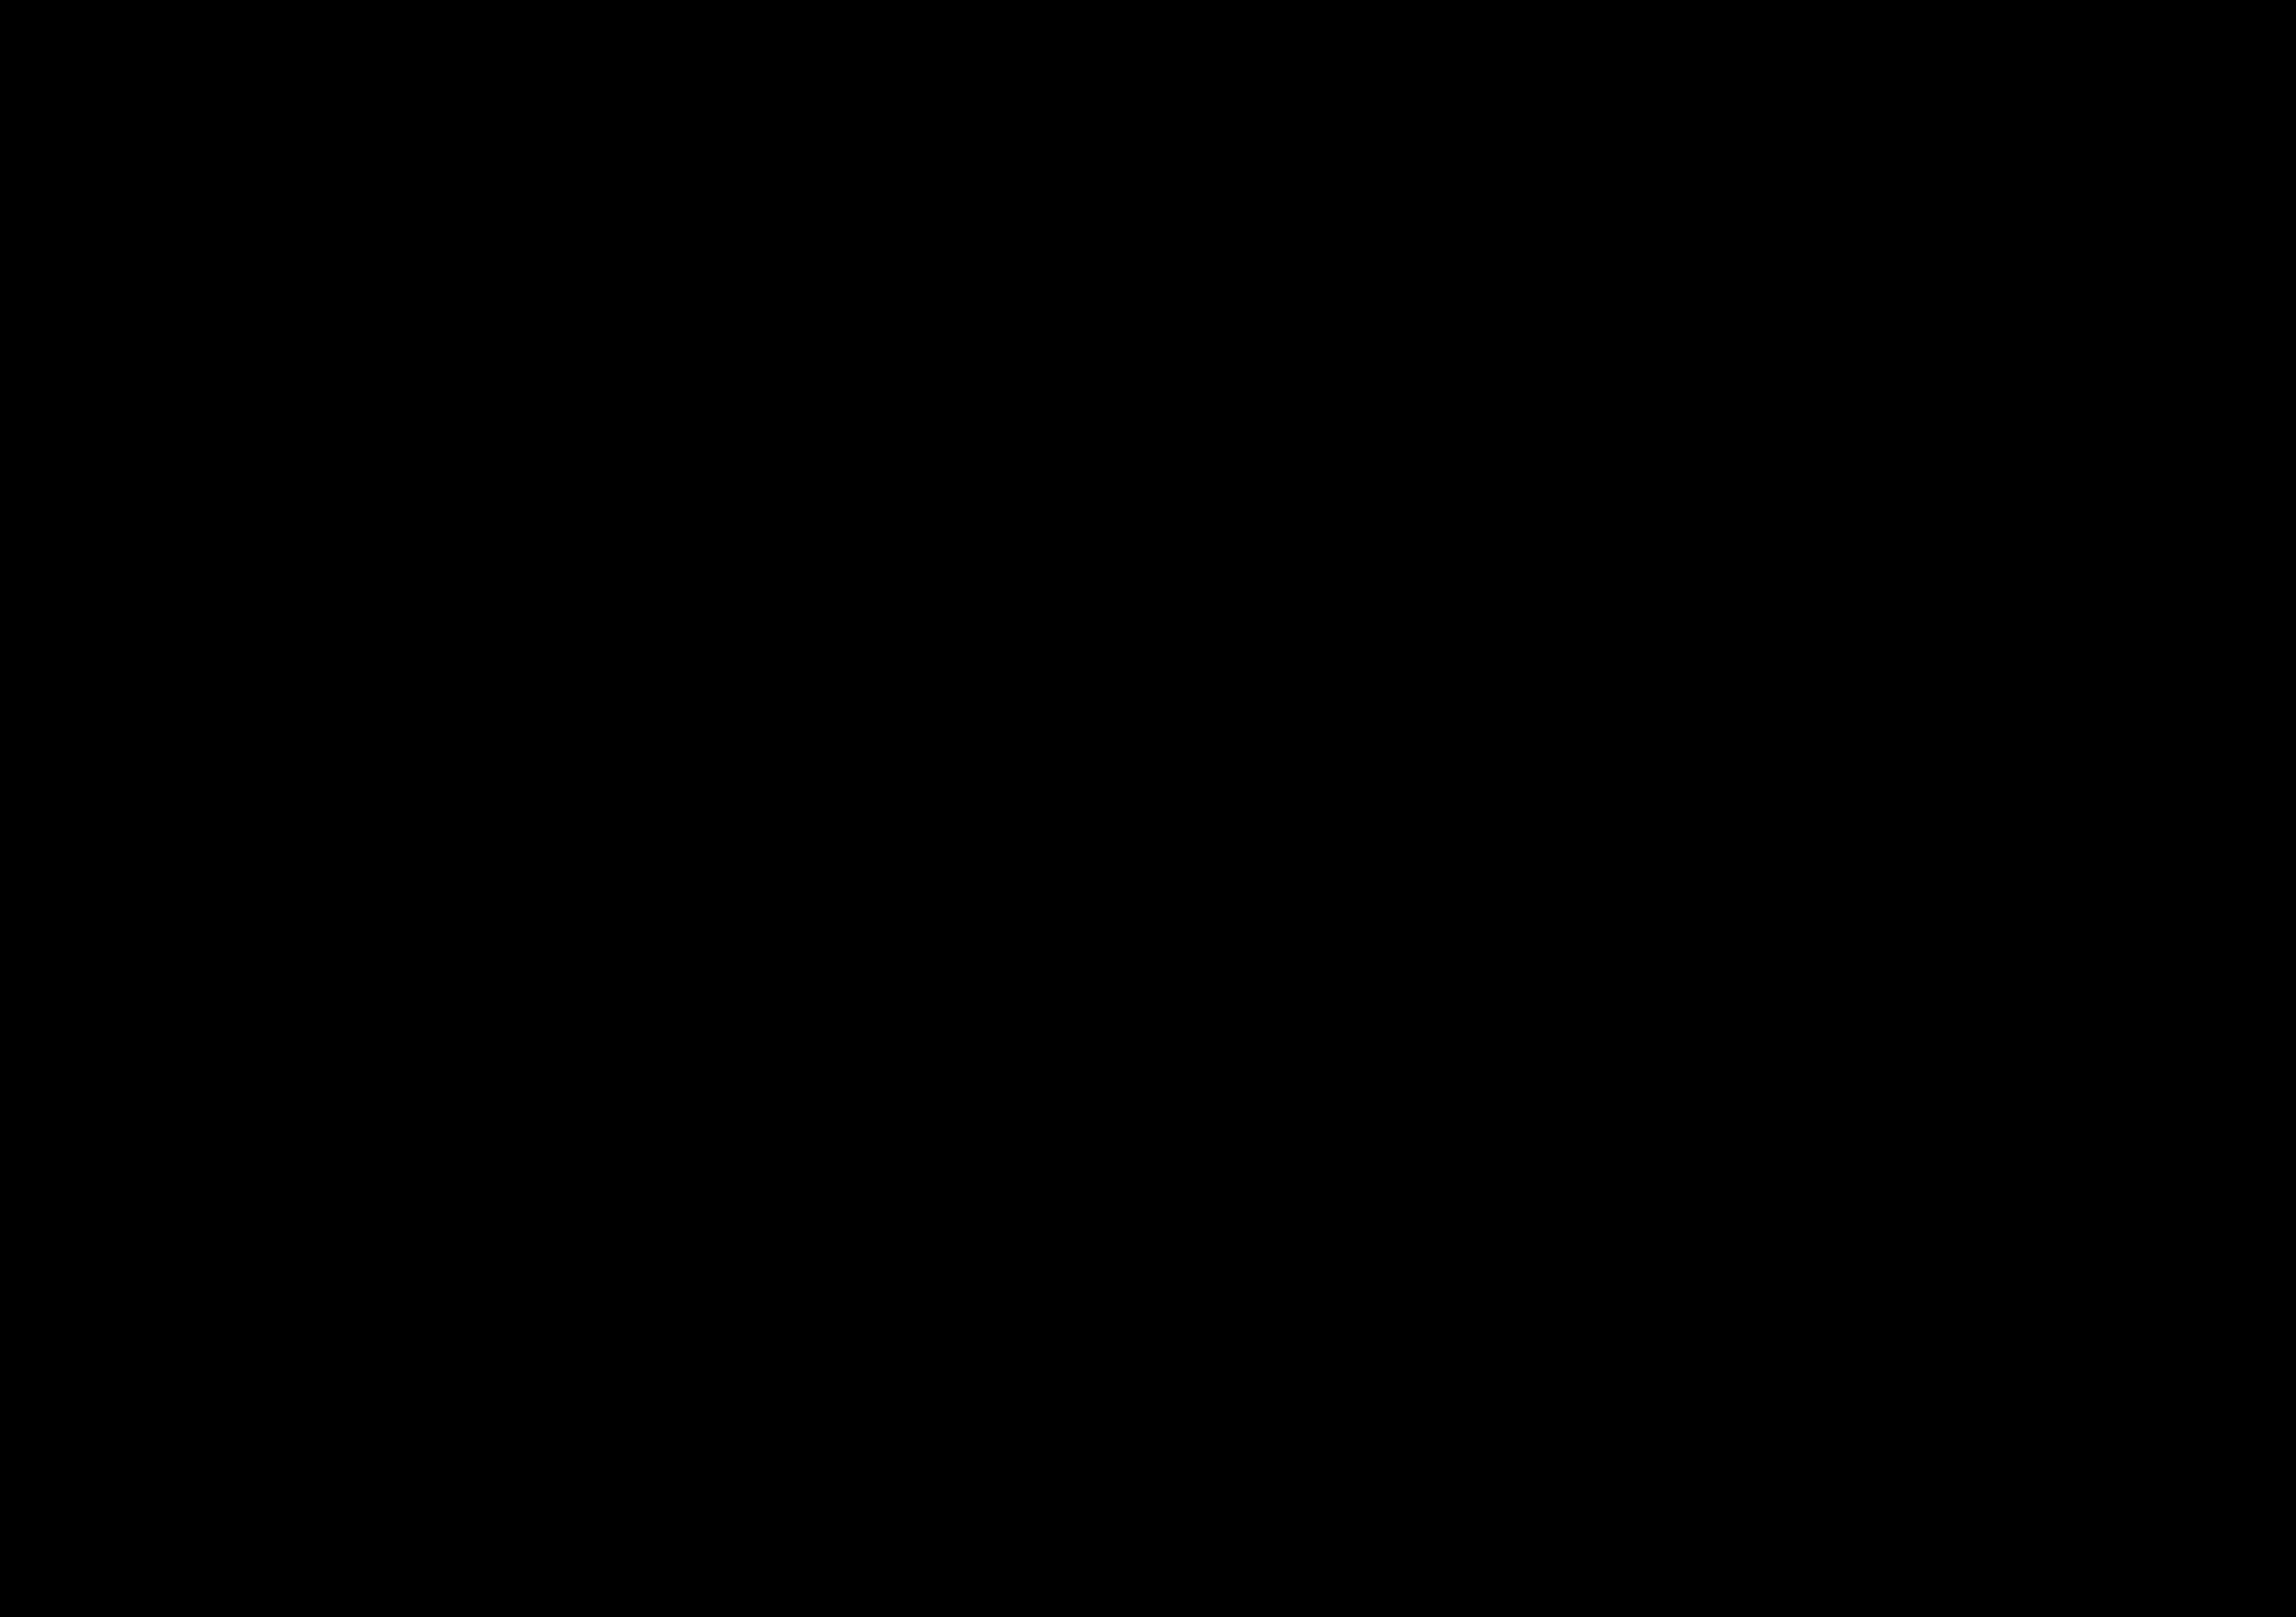 PRINTFLIX-logo-black (1).png